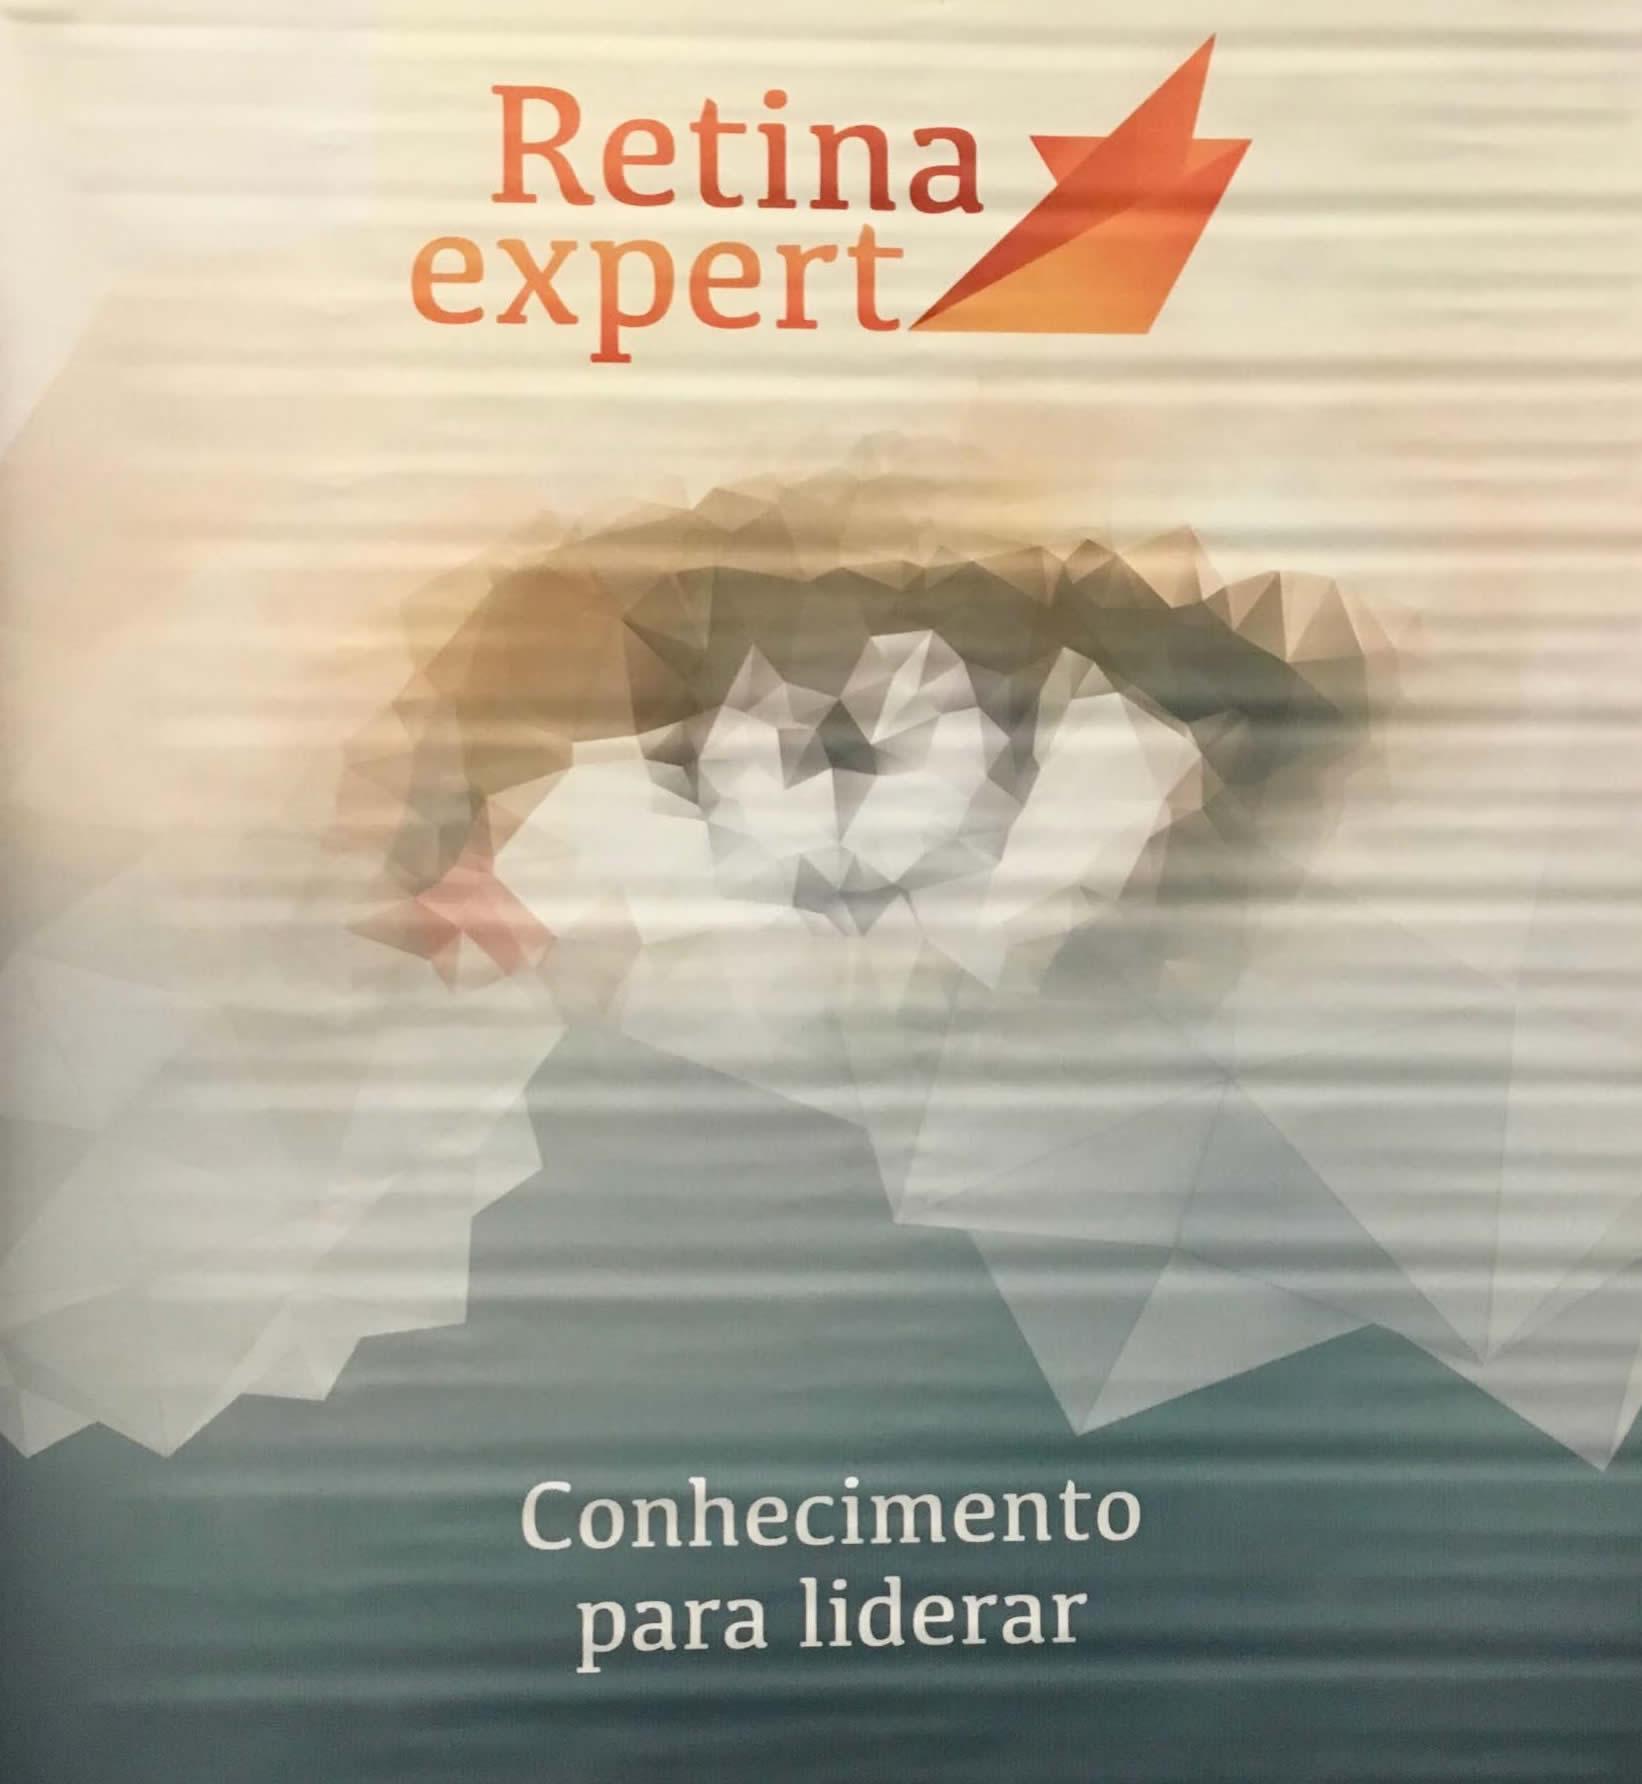 retina expert sao paulo novartis